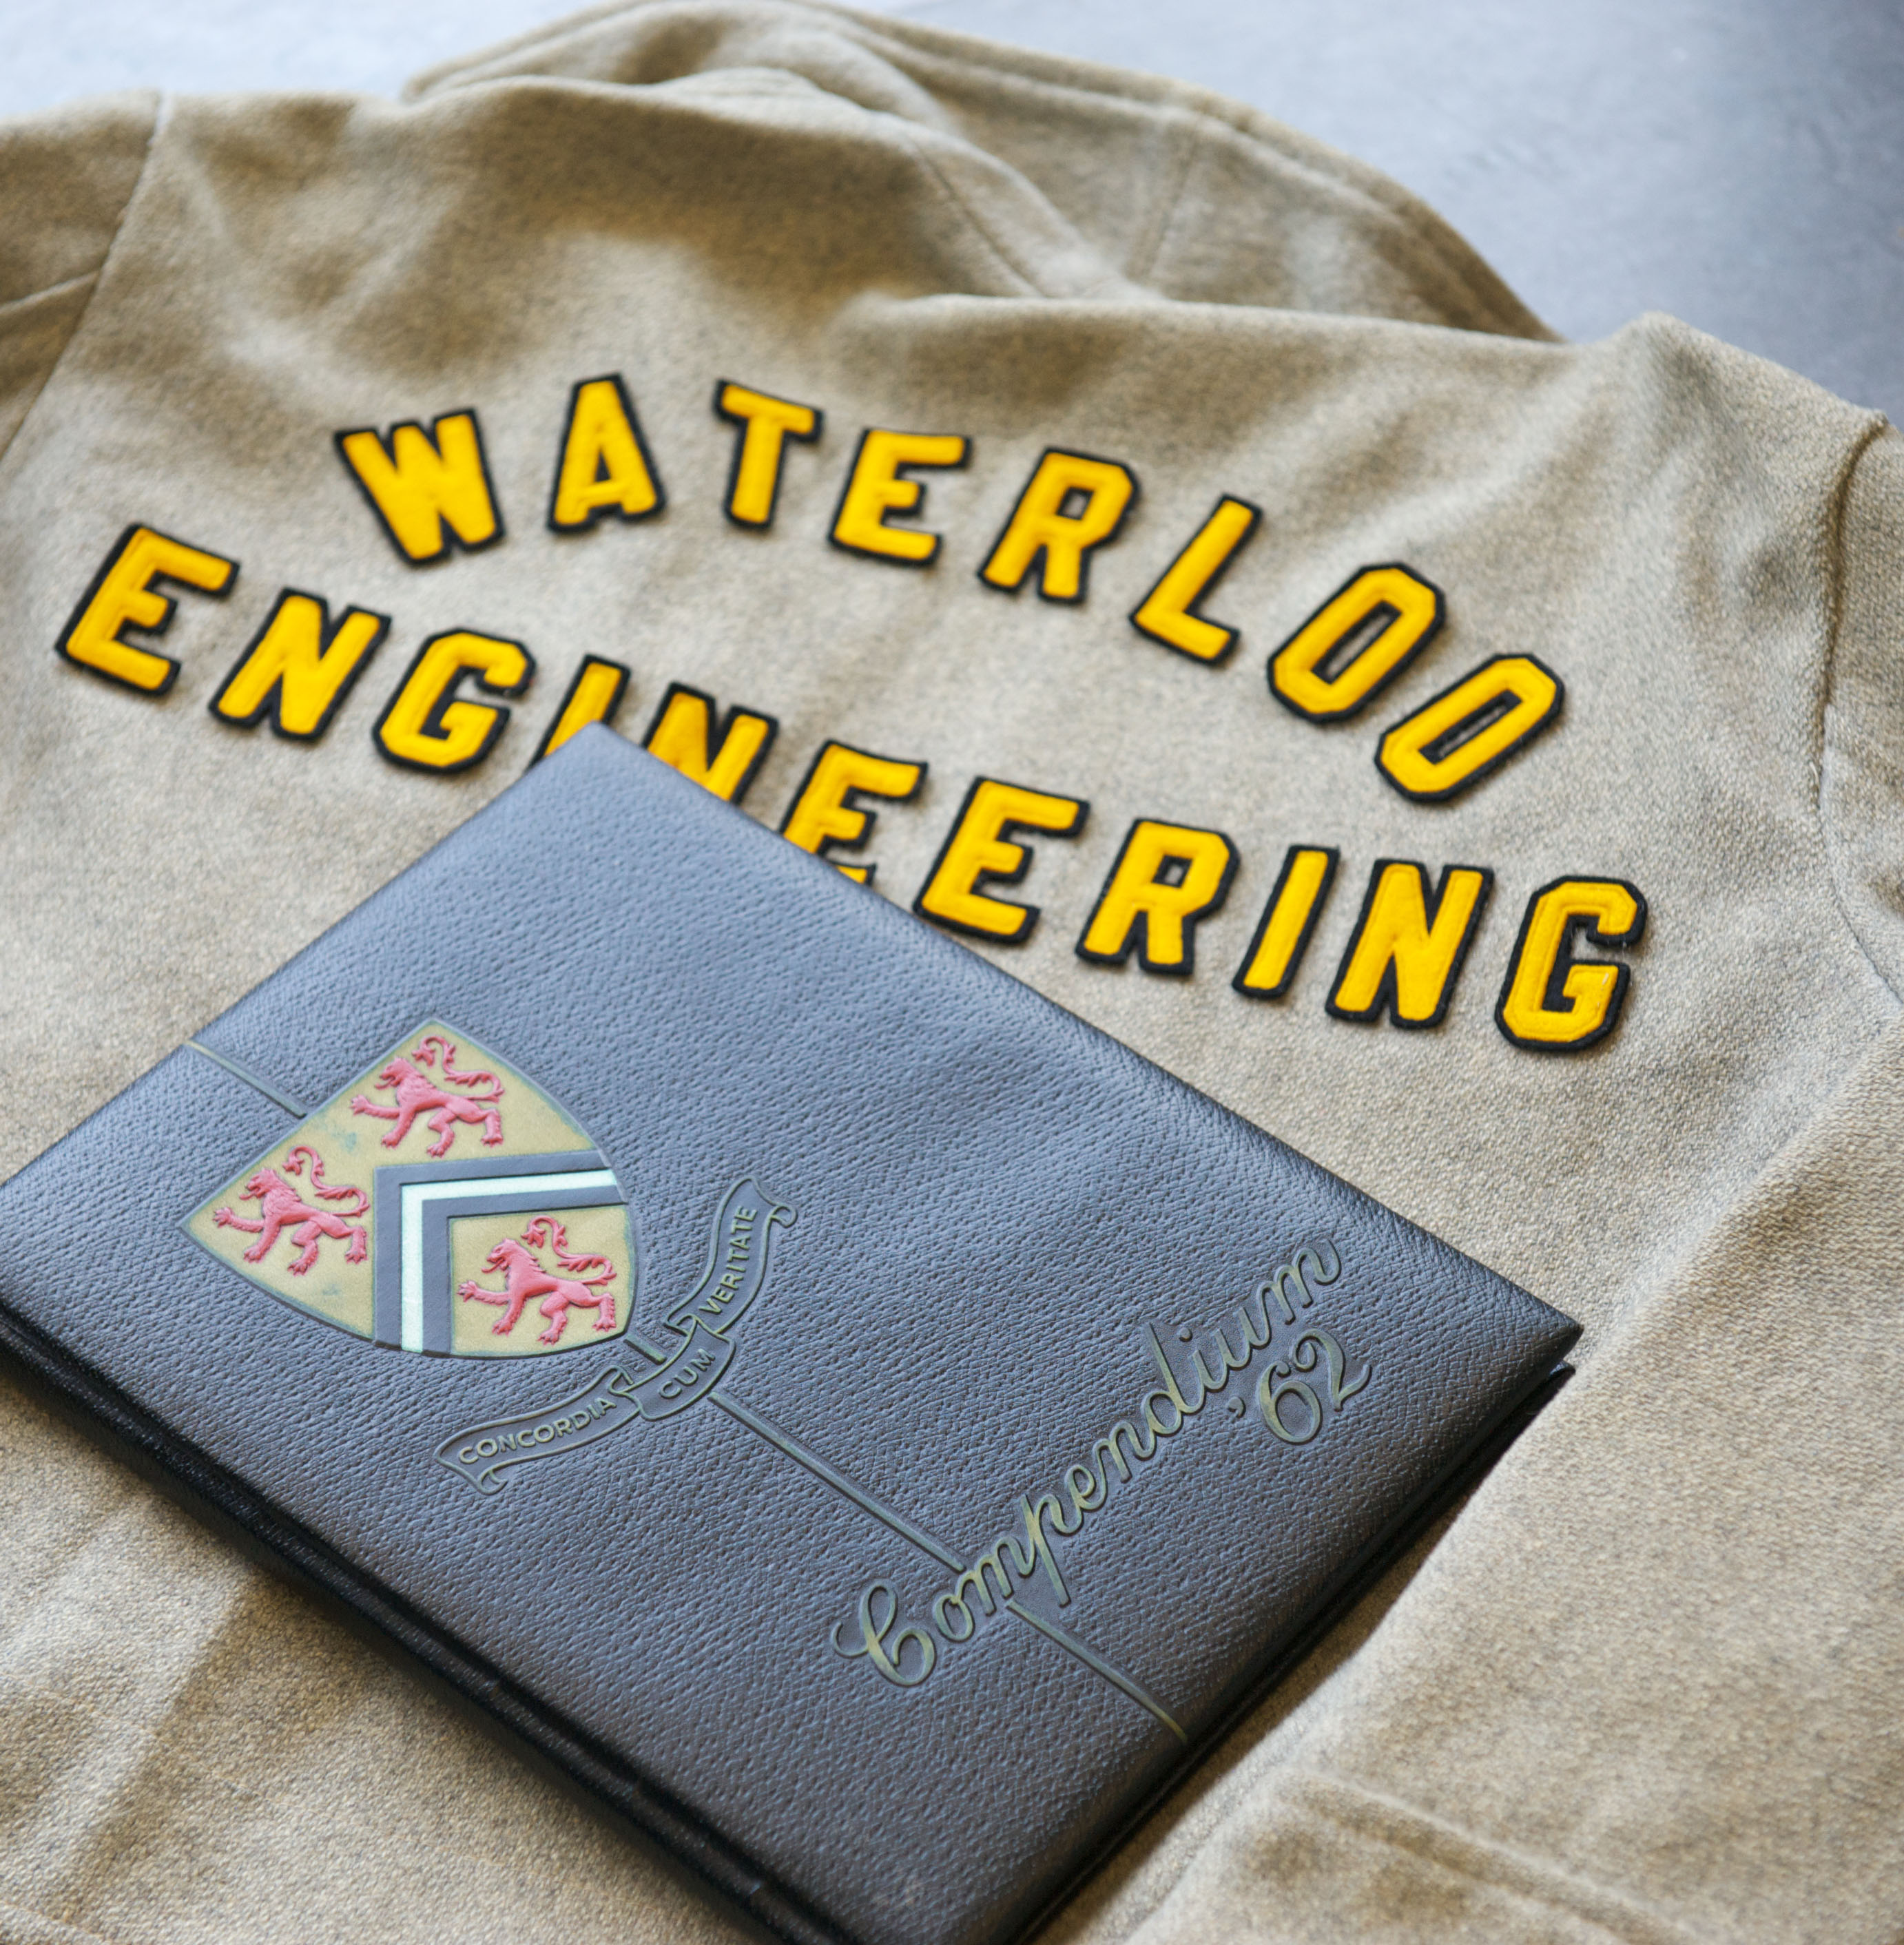 Engineering yearbook and jacket